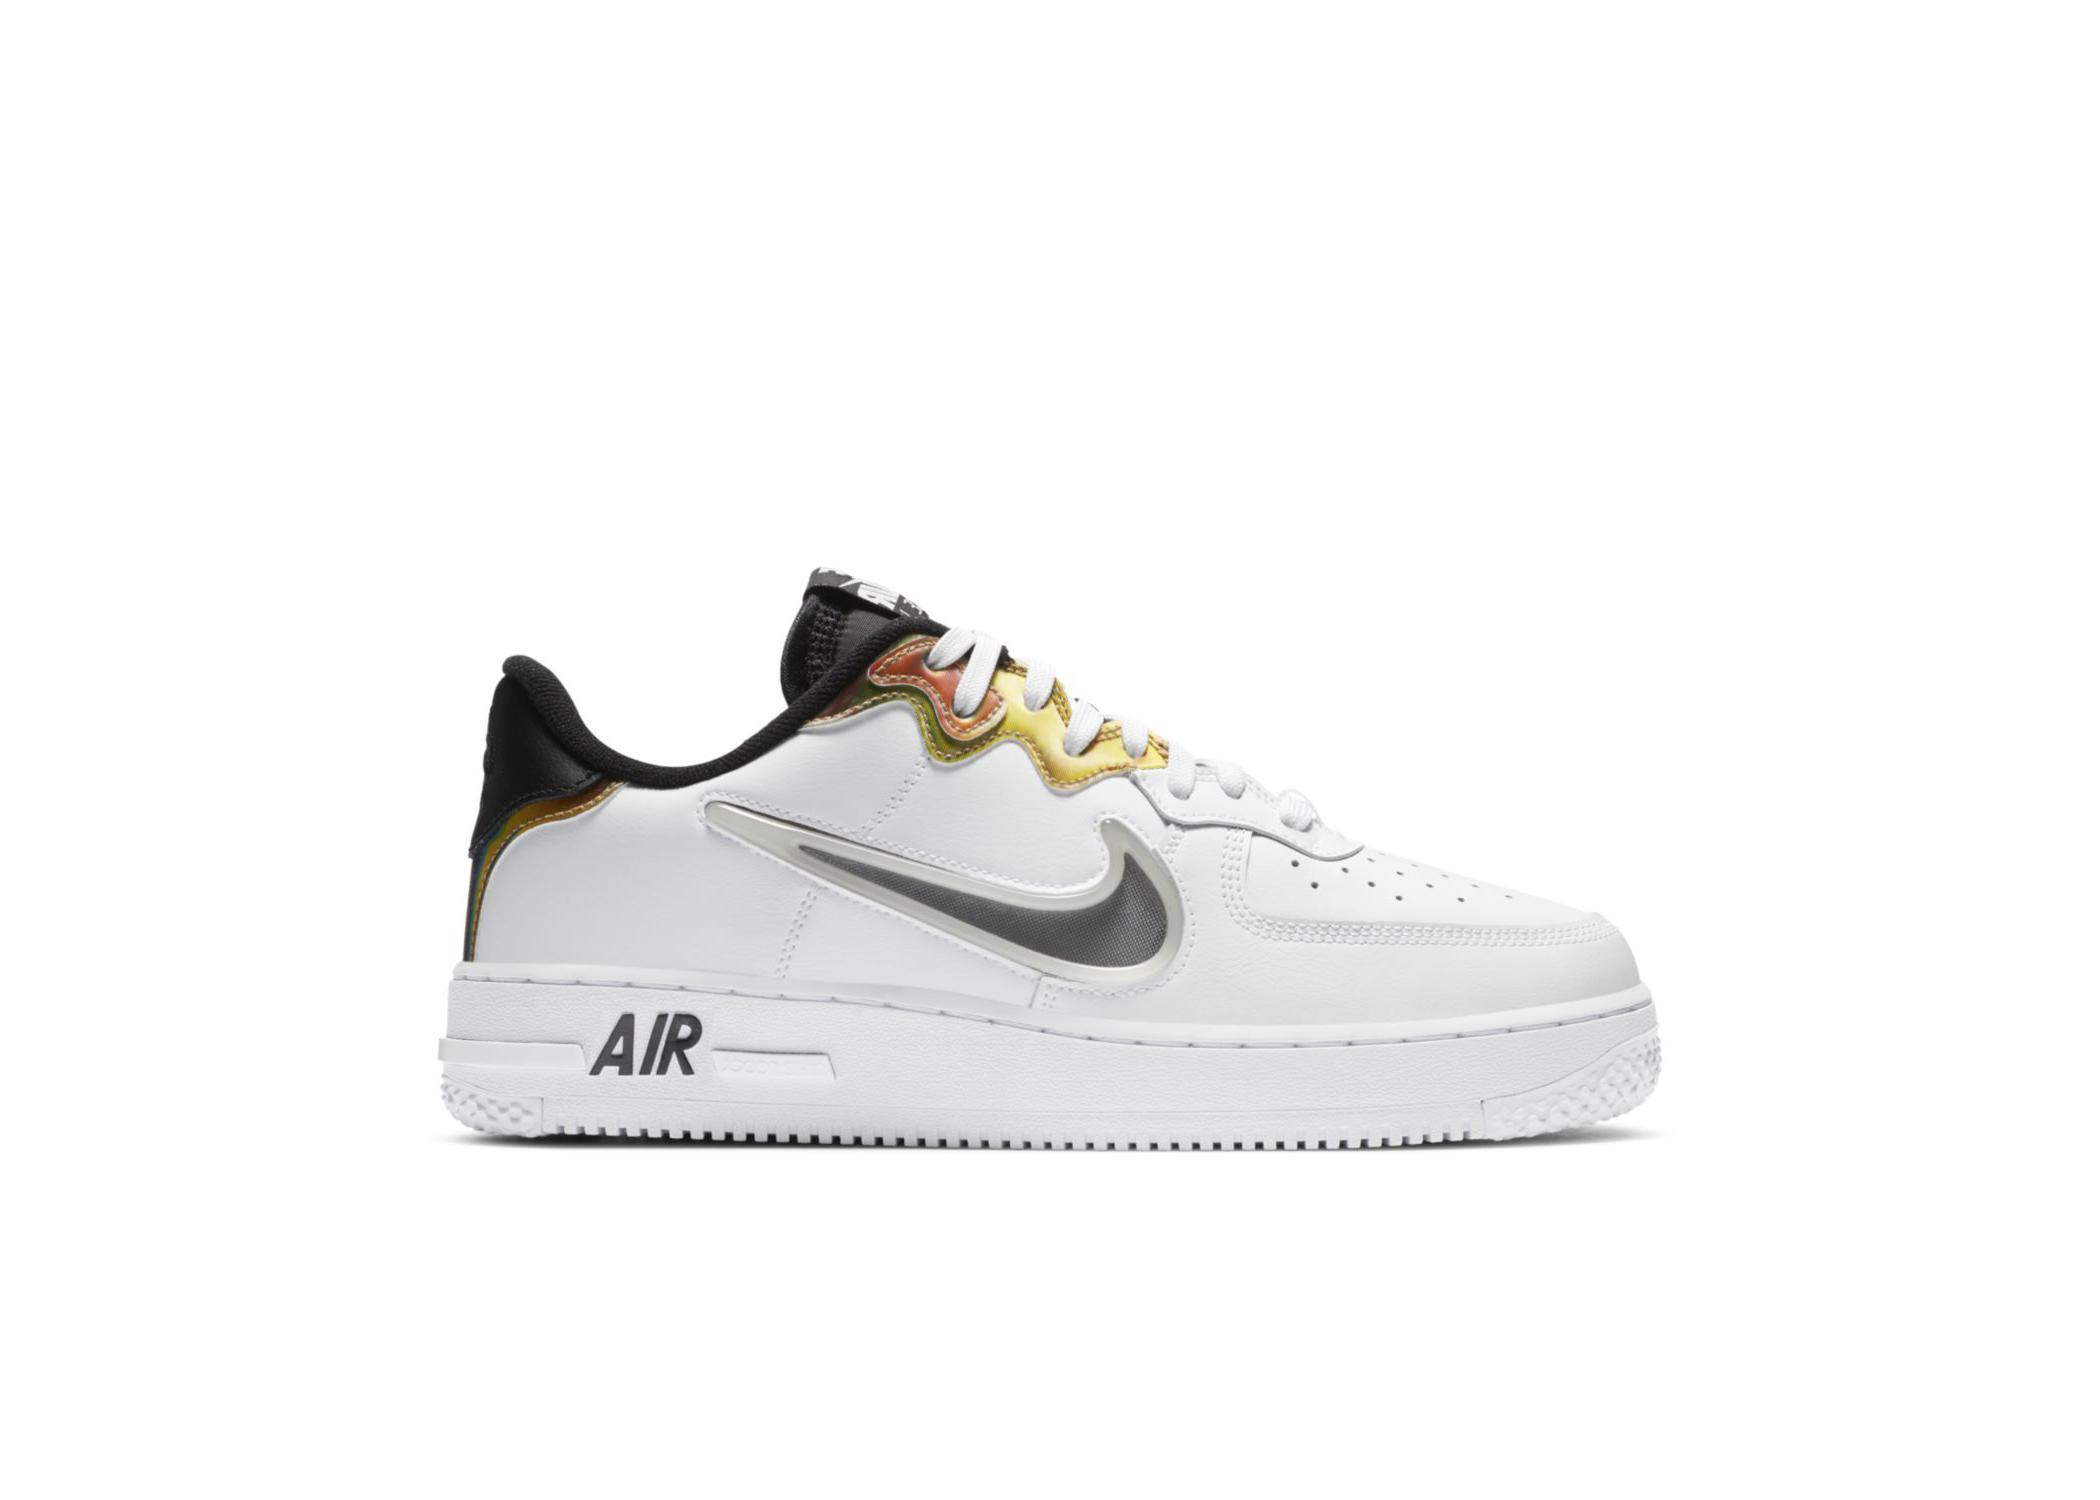 Nike Air Force 1 React LV8 White Glow - CN9838-100